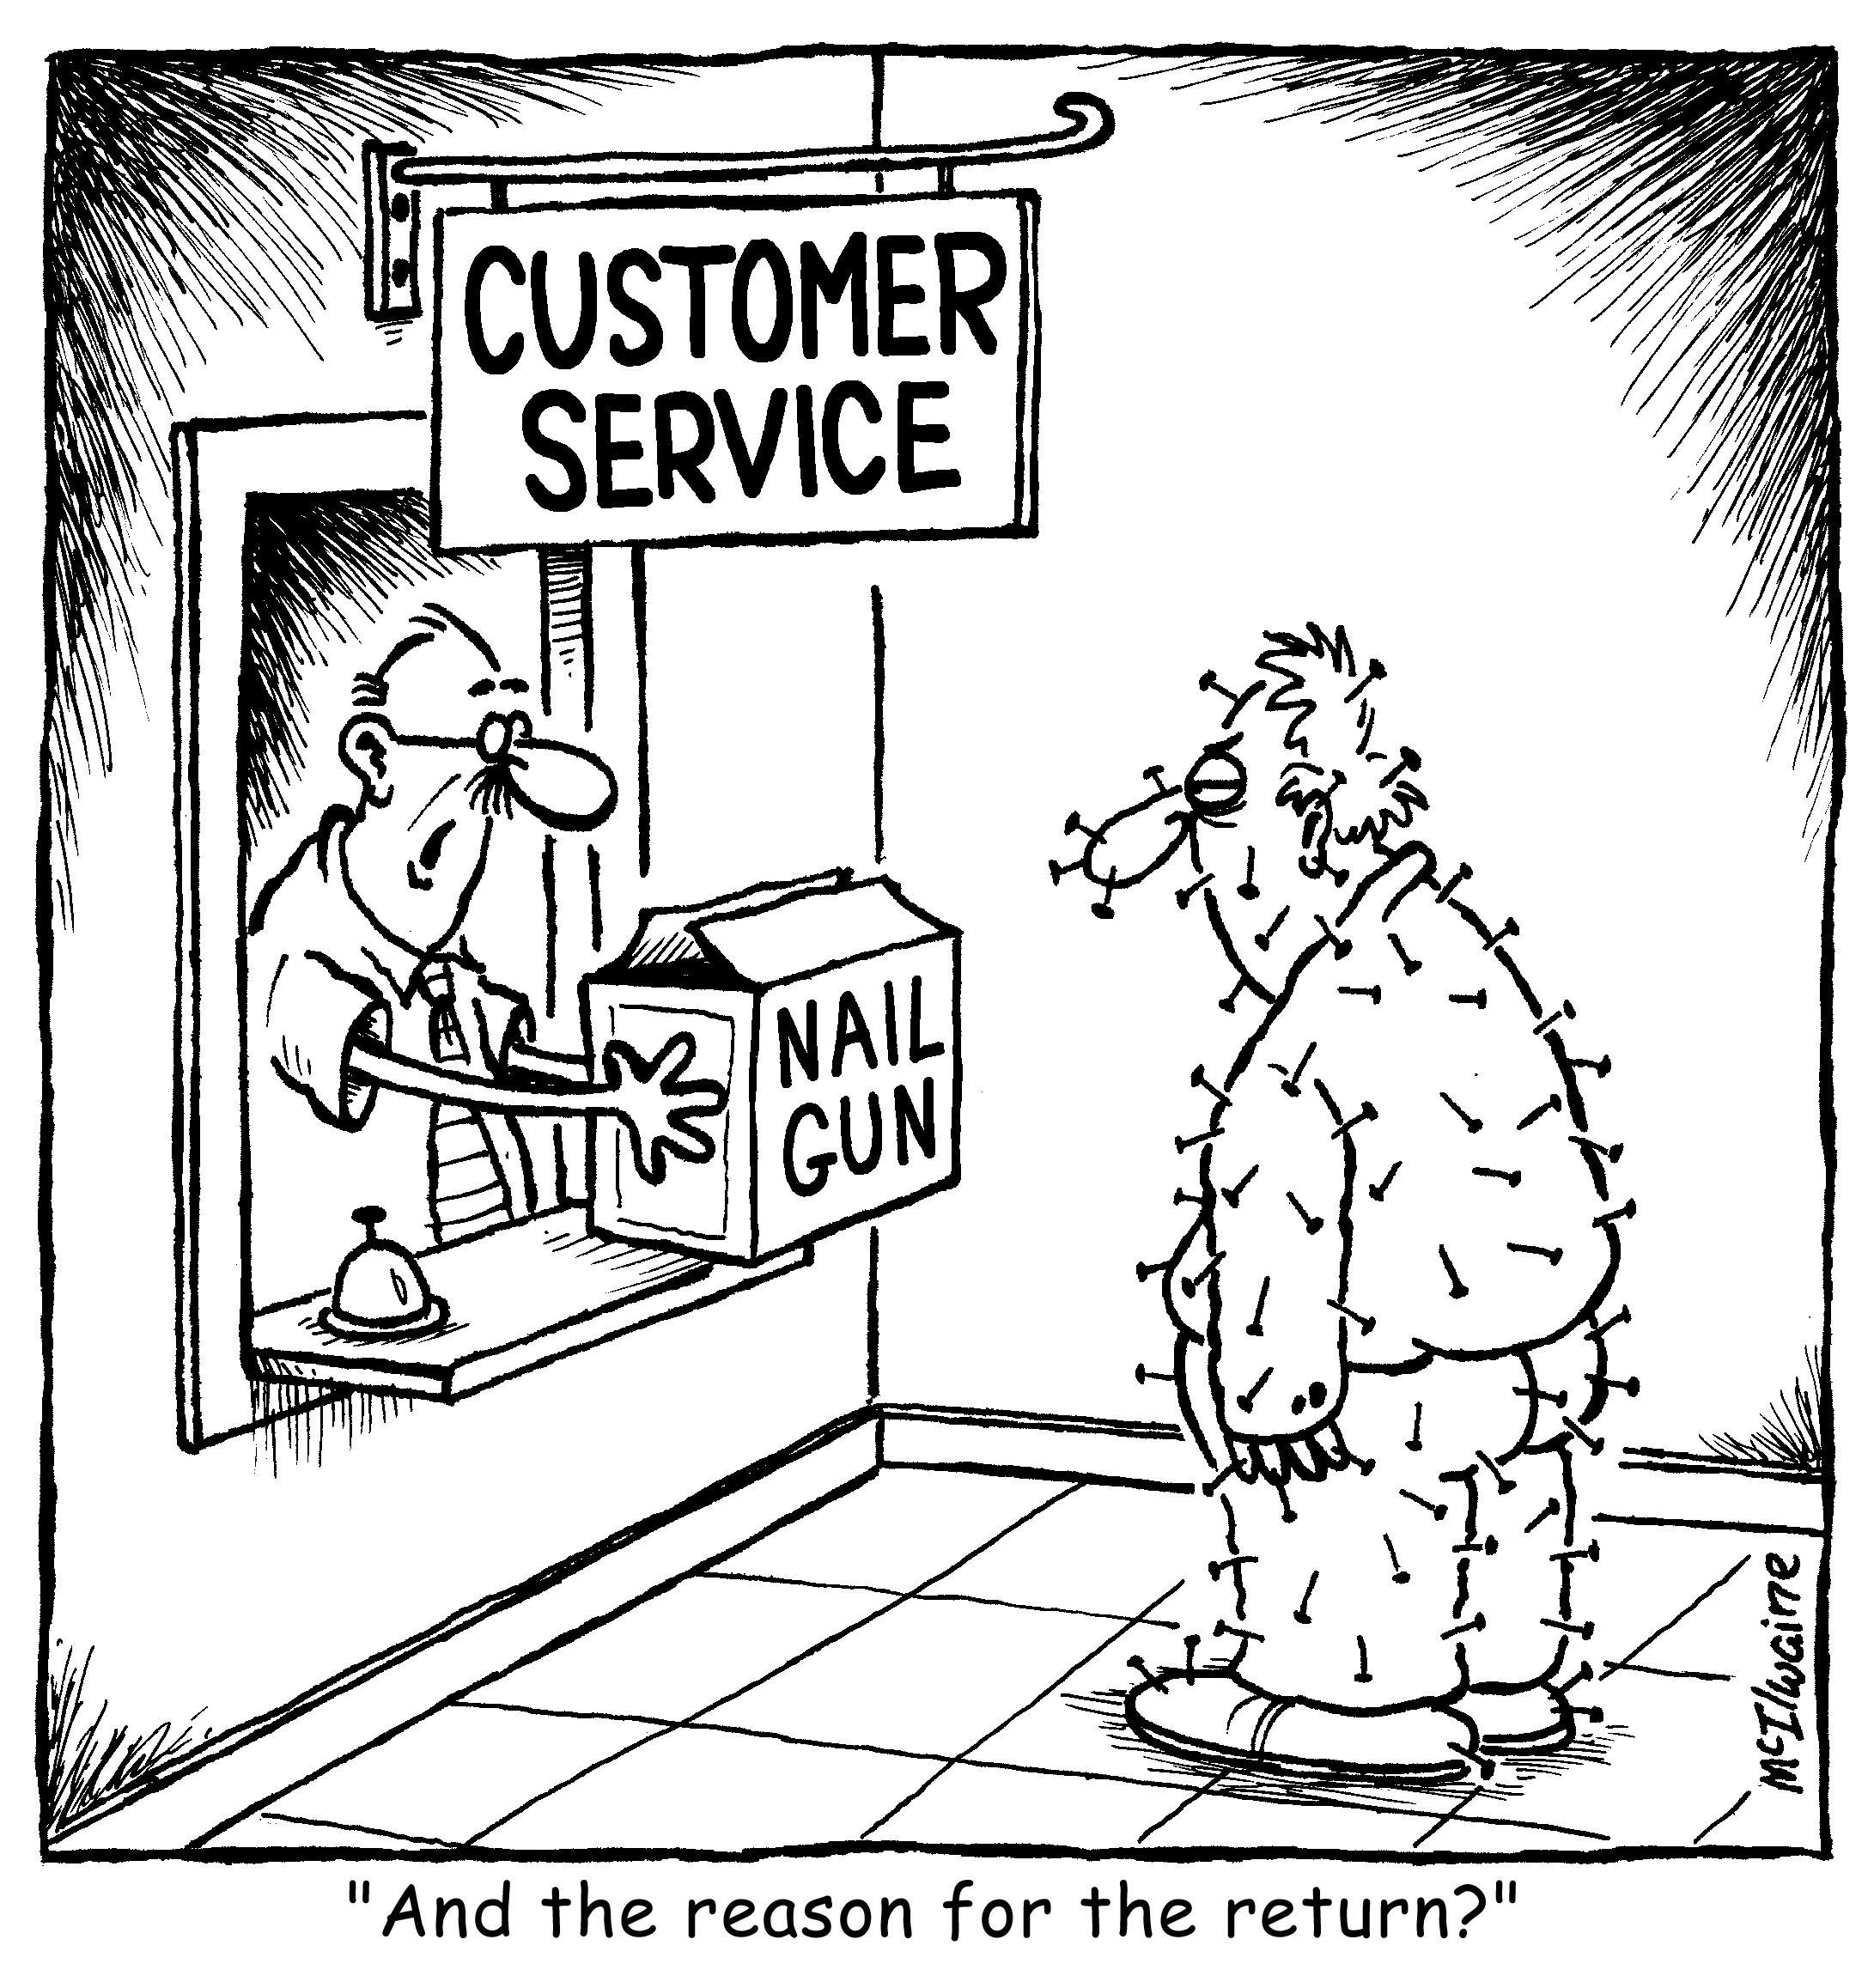 Invest in Customer Service